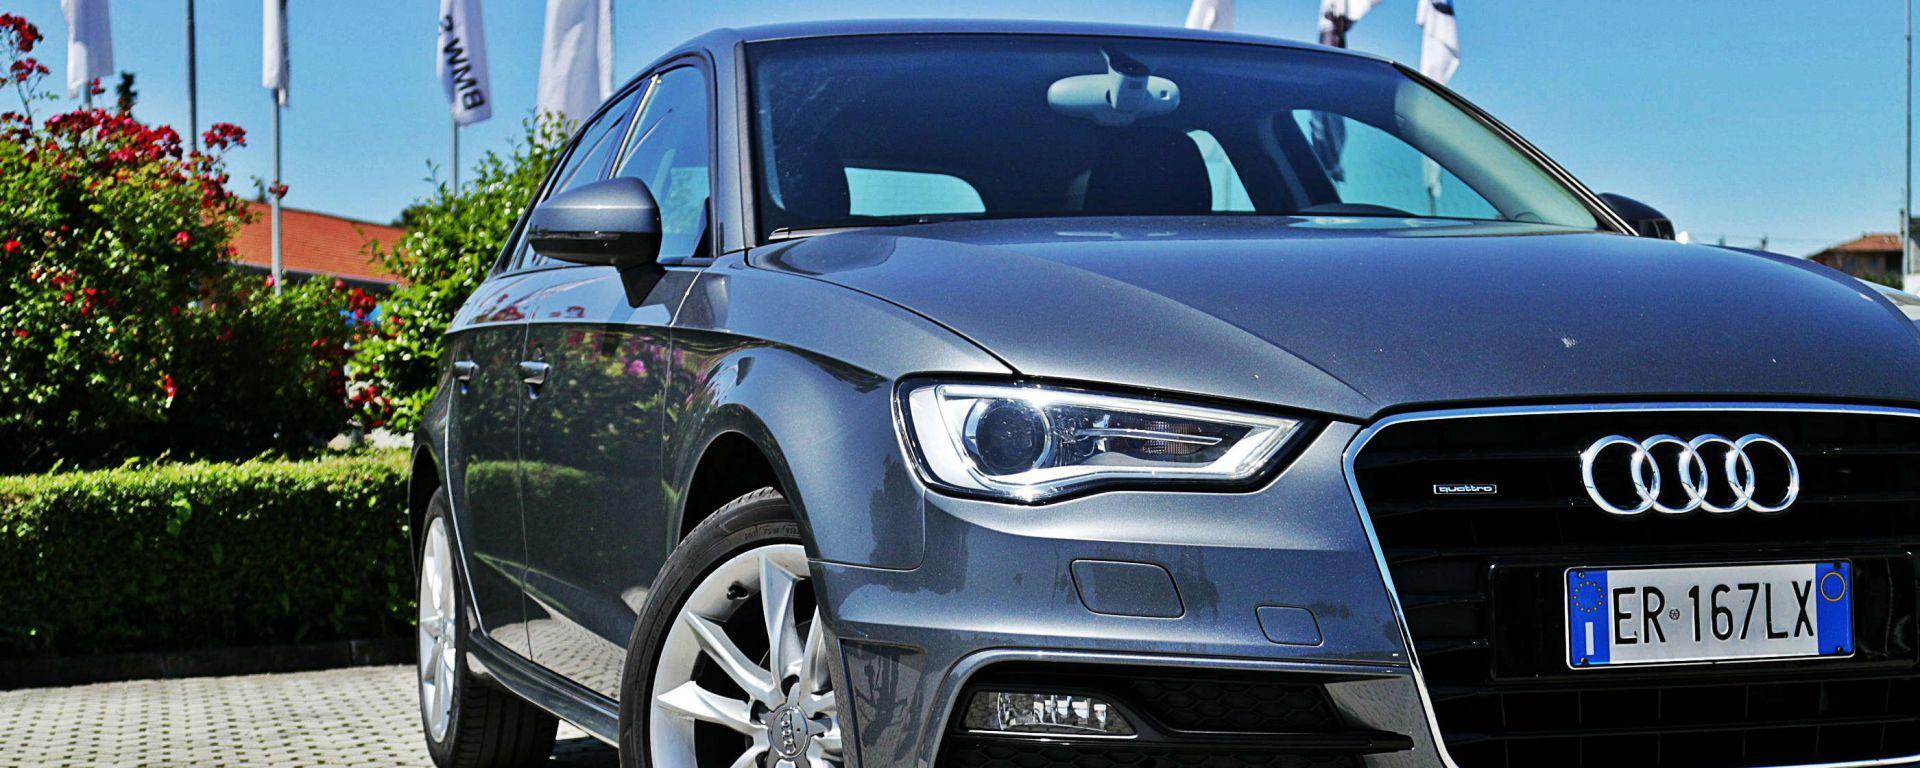 Audi A3 Sportback: Check Up usato [Video]